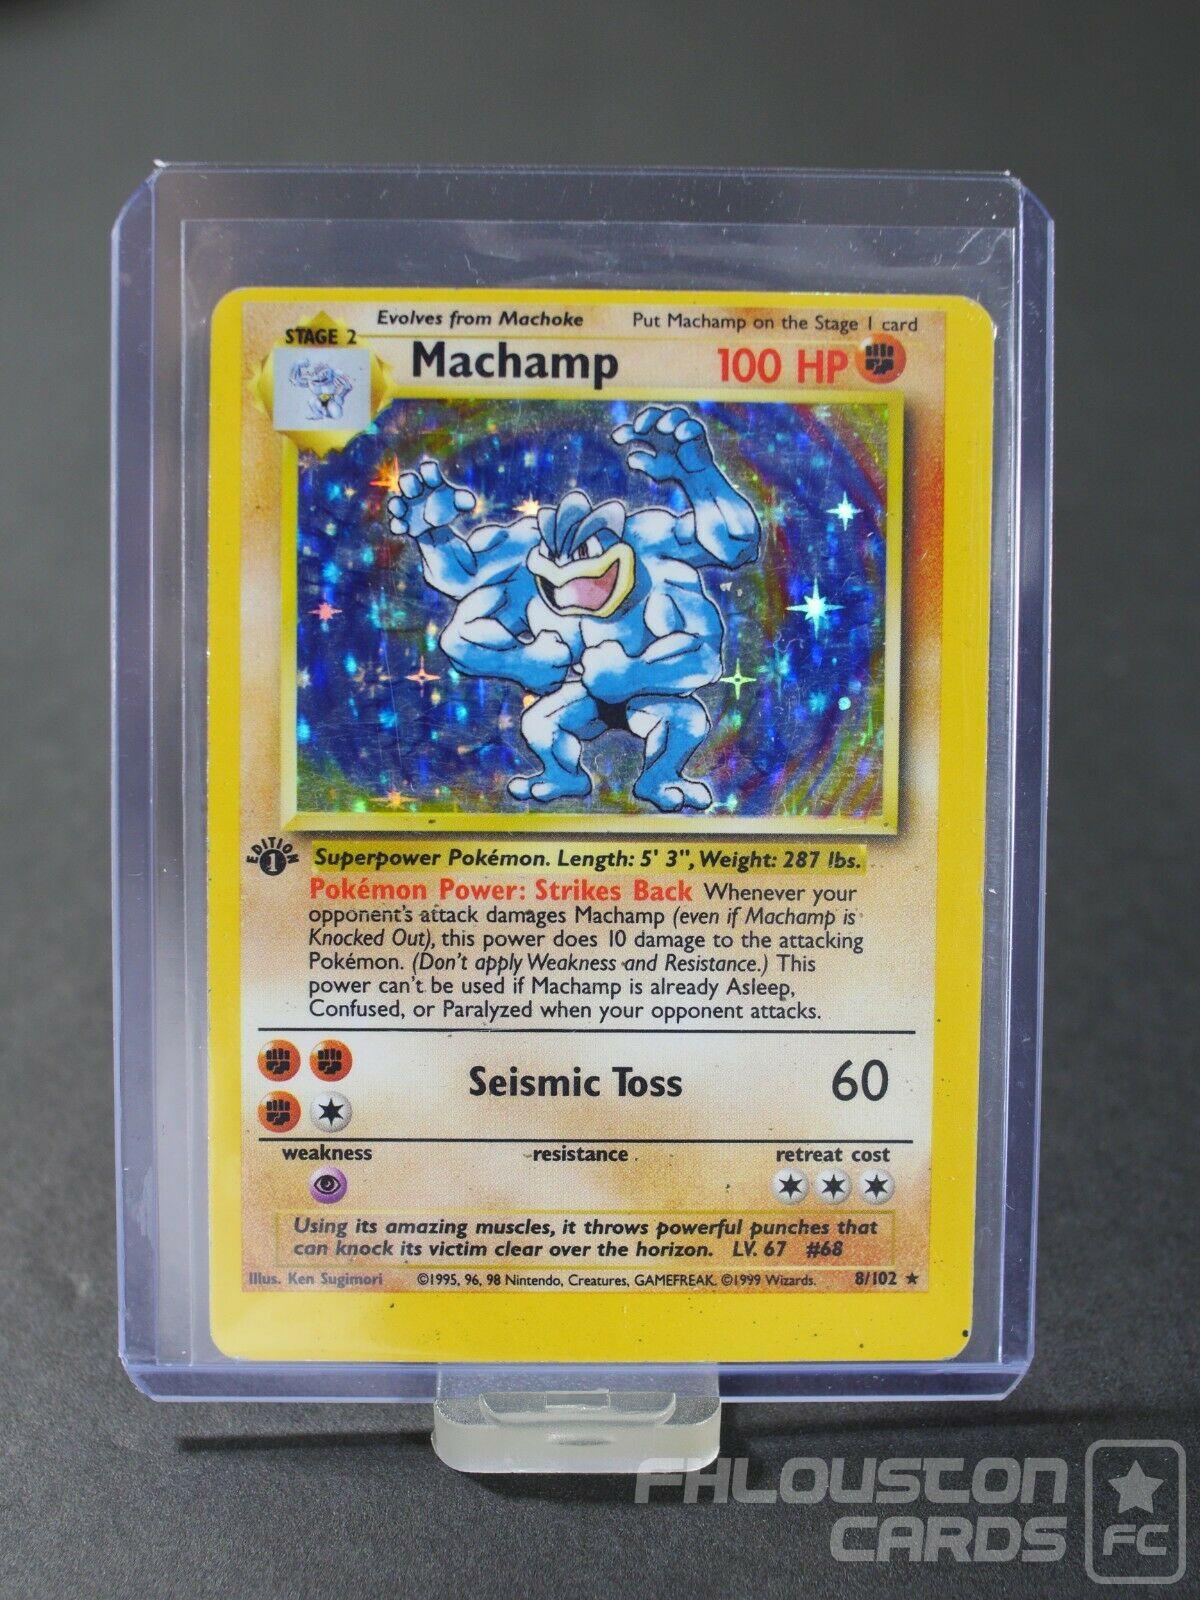 Very Miscut Machamp Holo 1st Edition 8102 Misprint Rare Pokemon Card